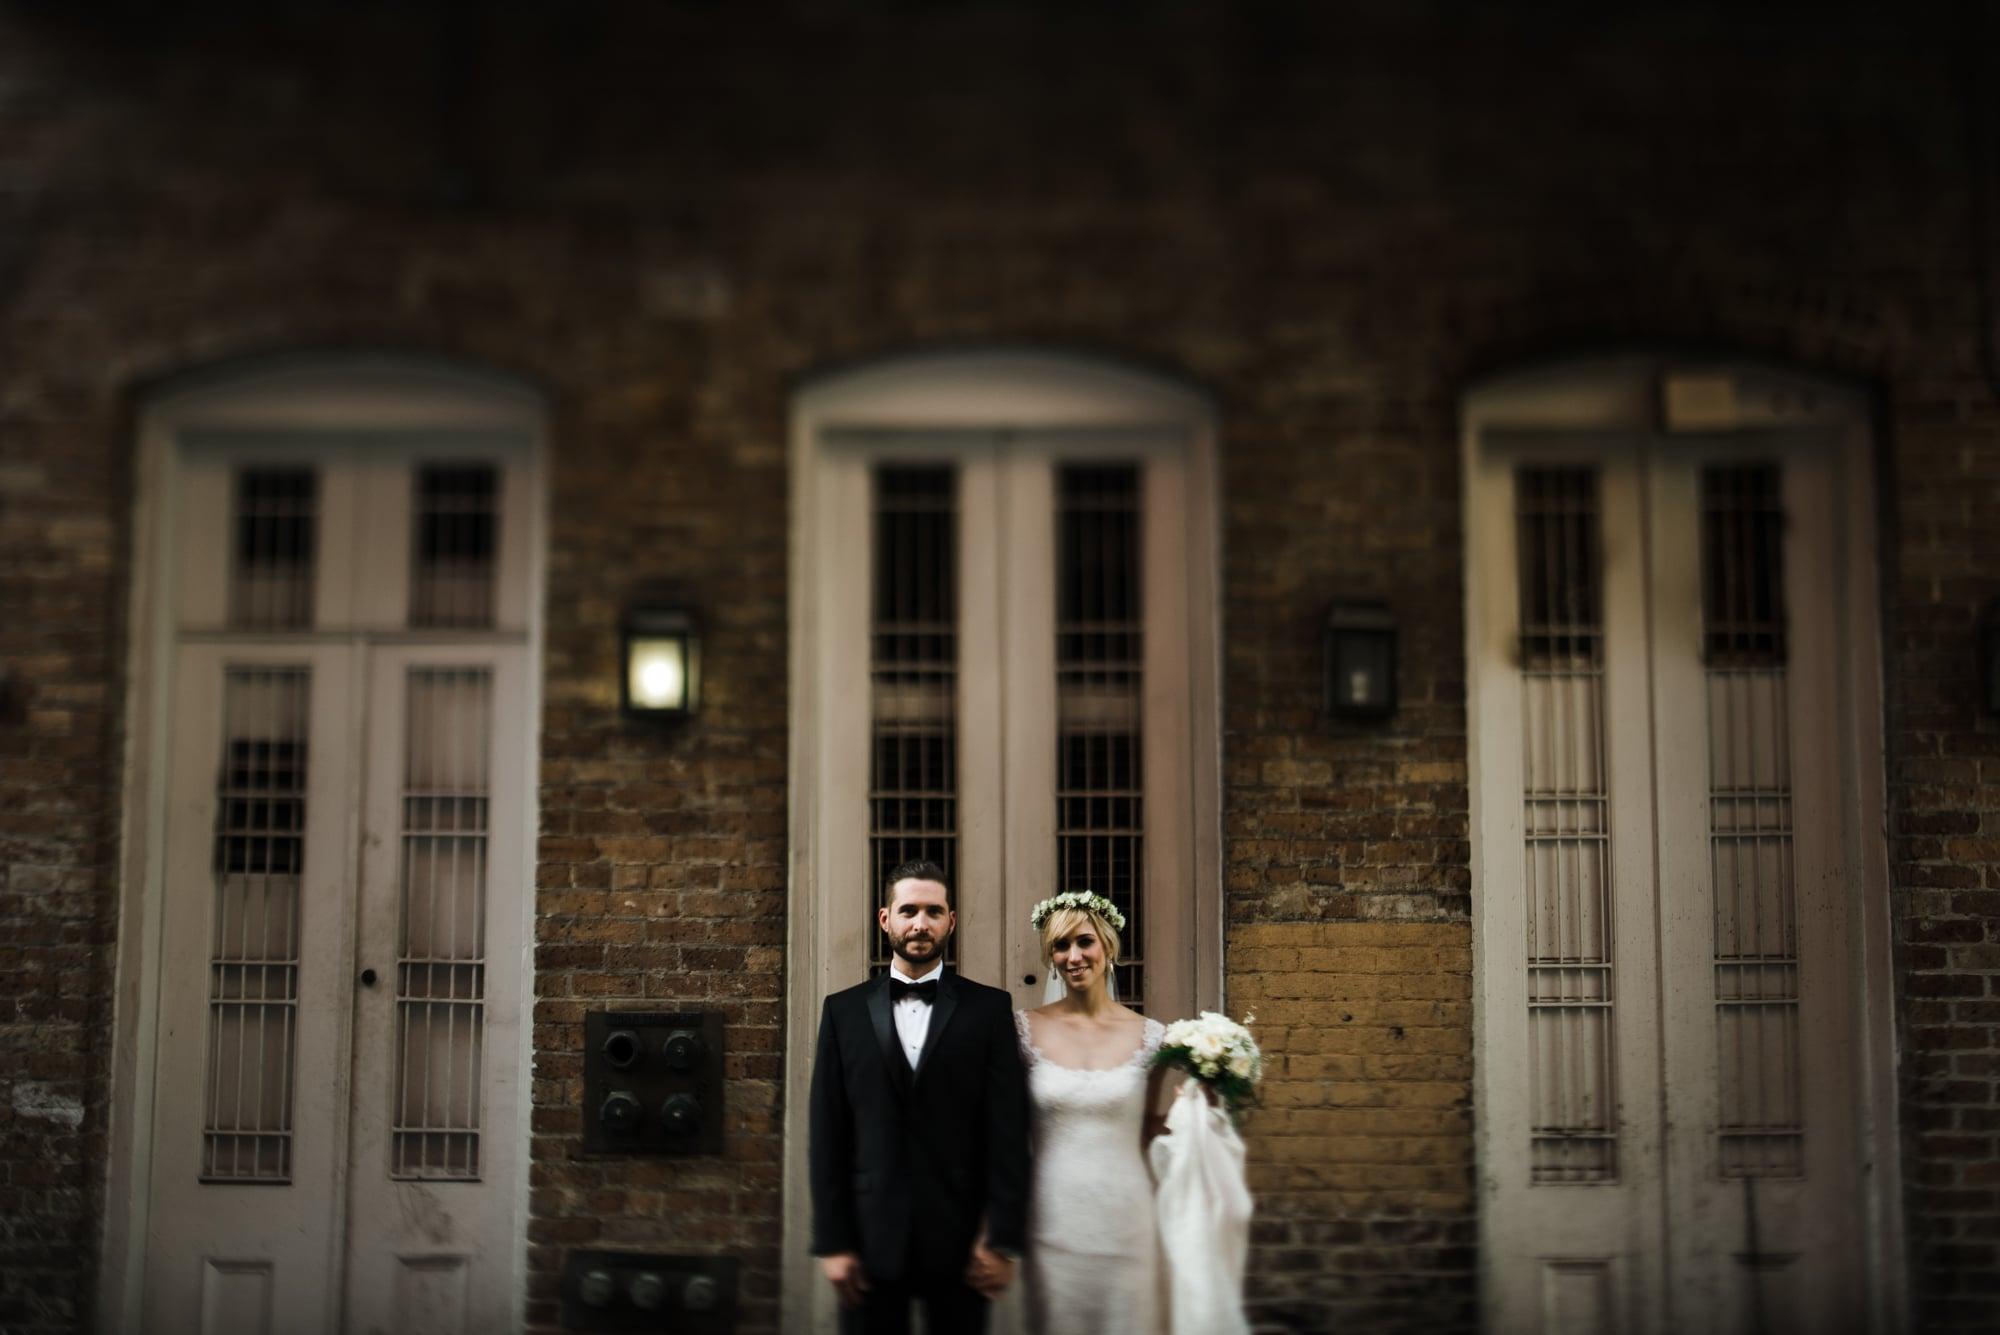 ©Isaiah & Taylor Photography - The Elms Mansion Wedding - New Orleans, Louisiana-47.jpg